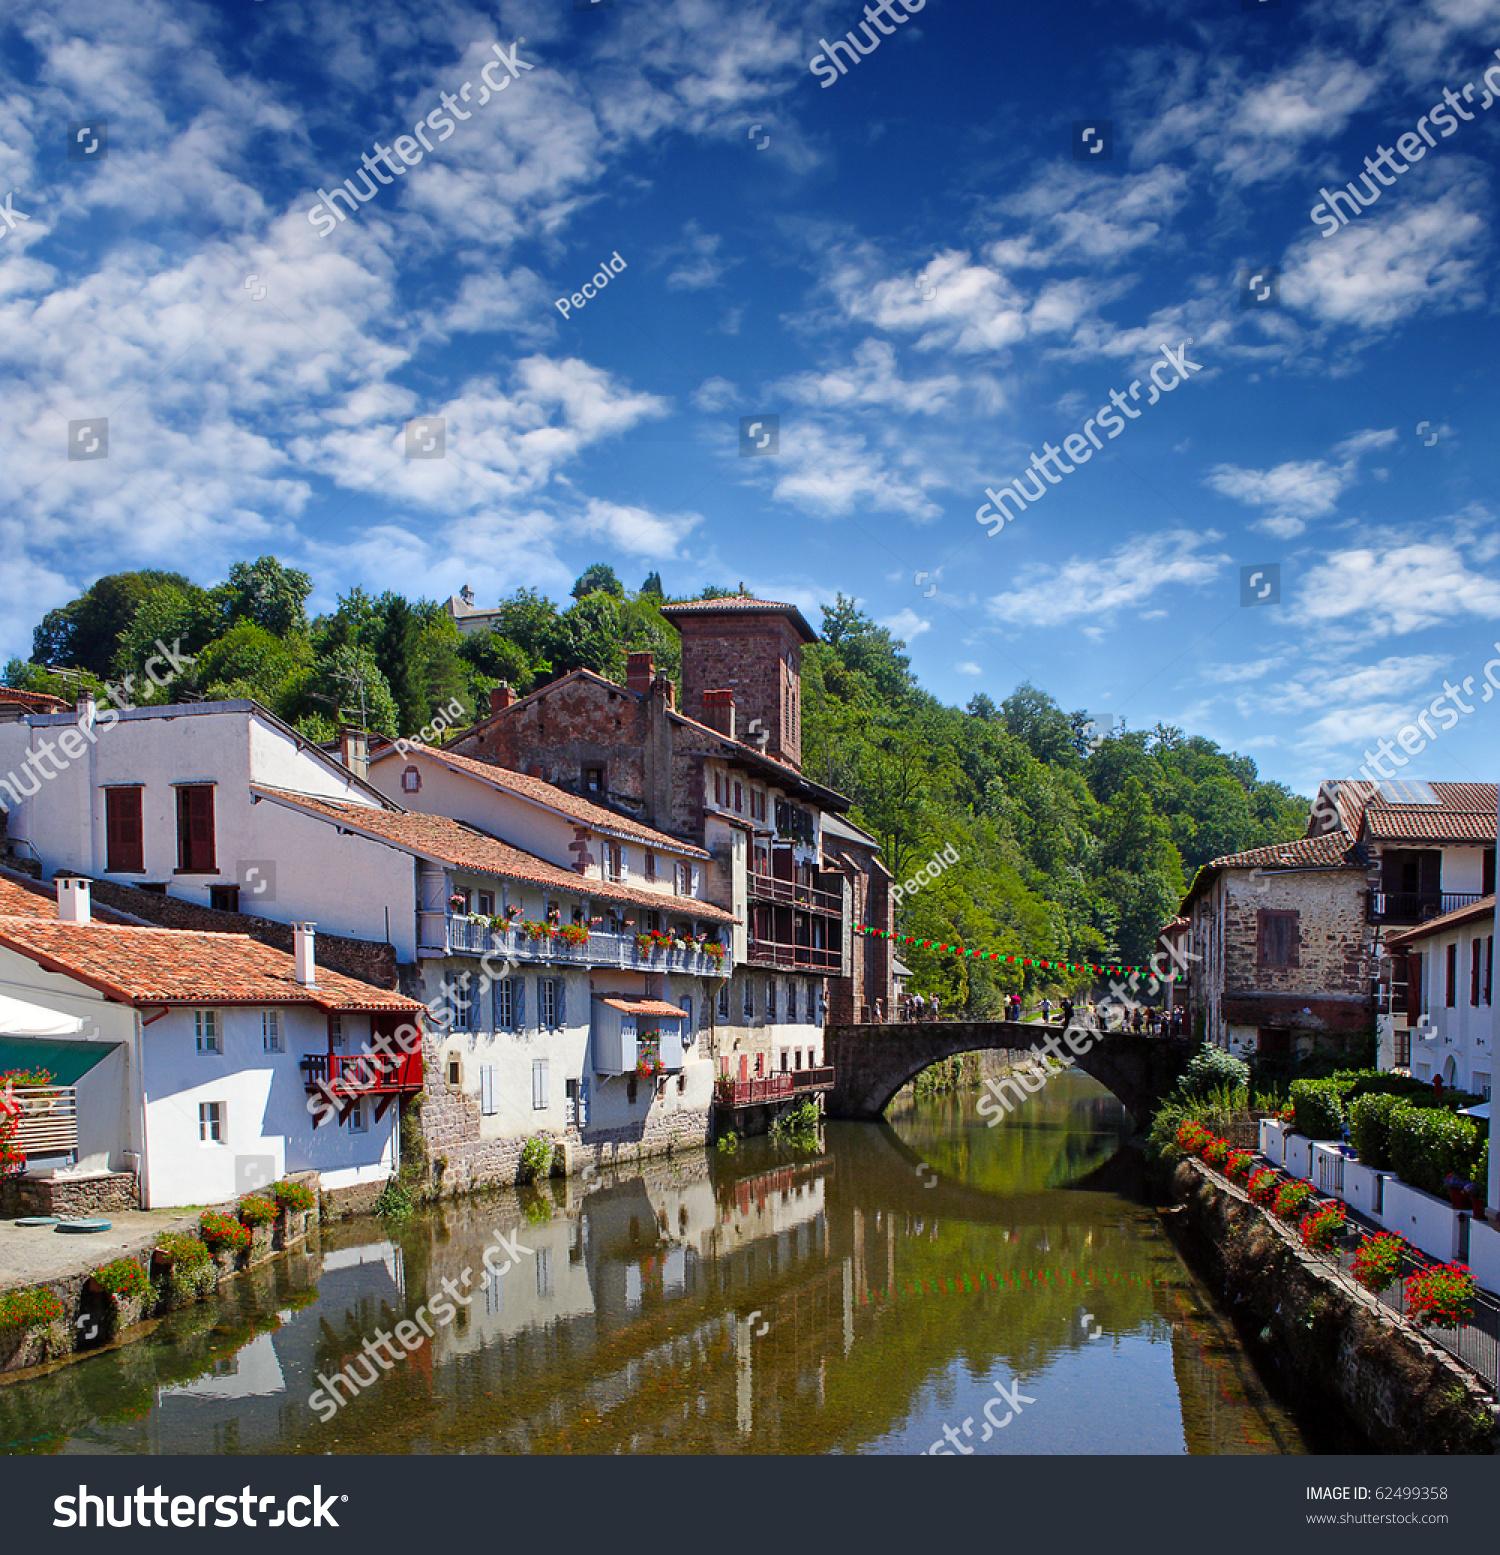 Saint jean pied de port camino gallery - How to get to saint jean pied de port ...